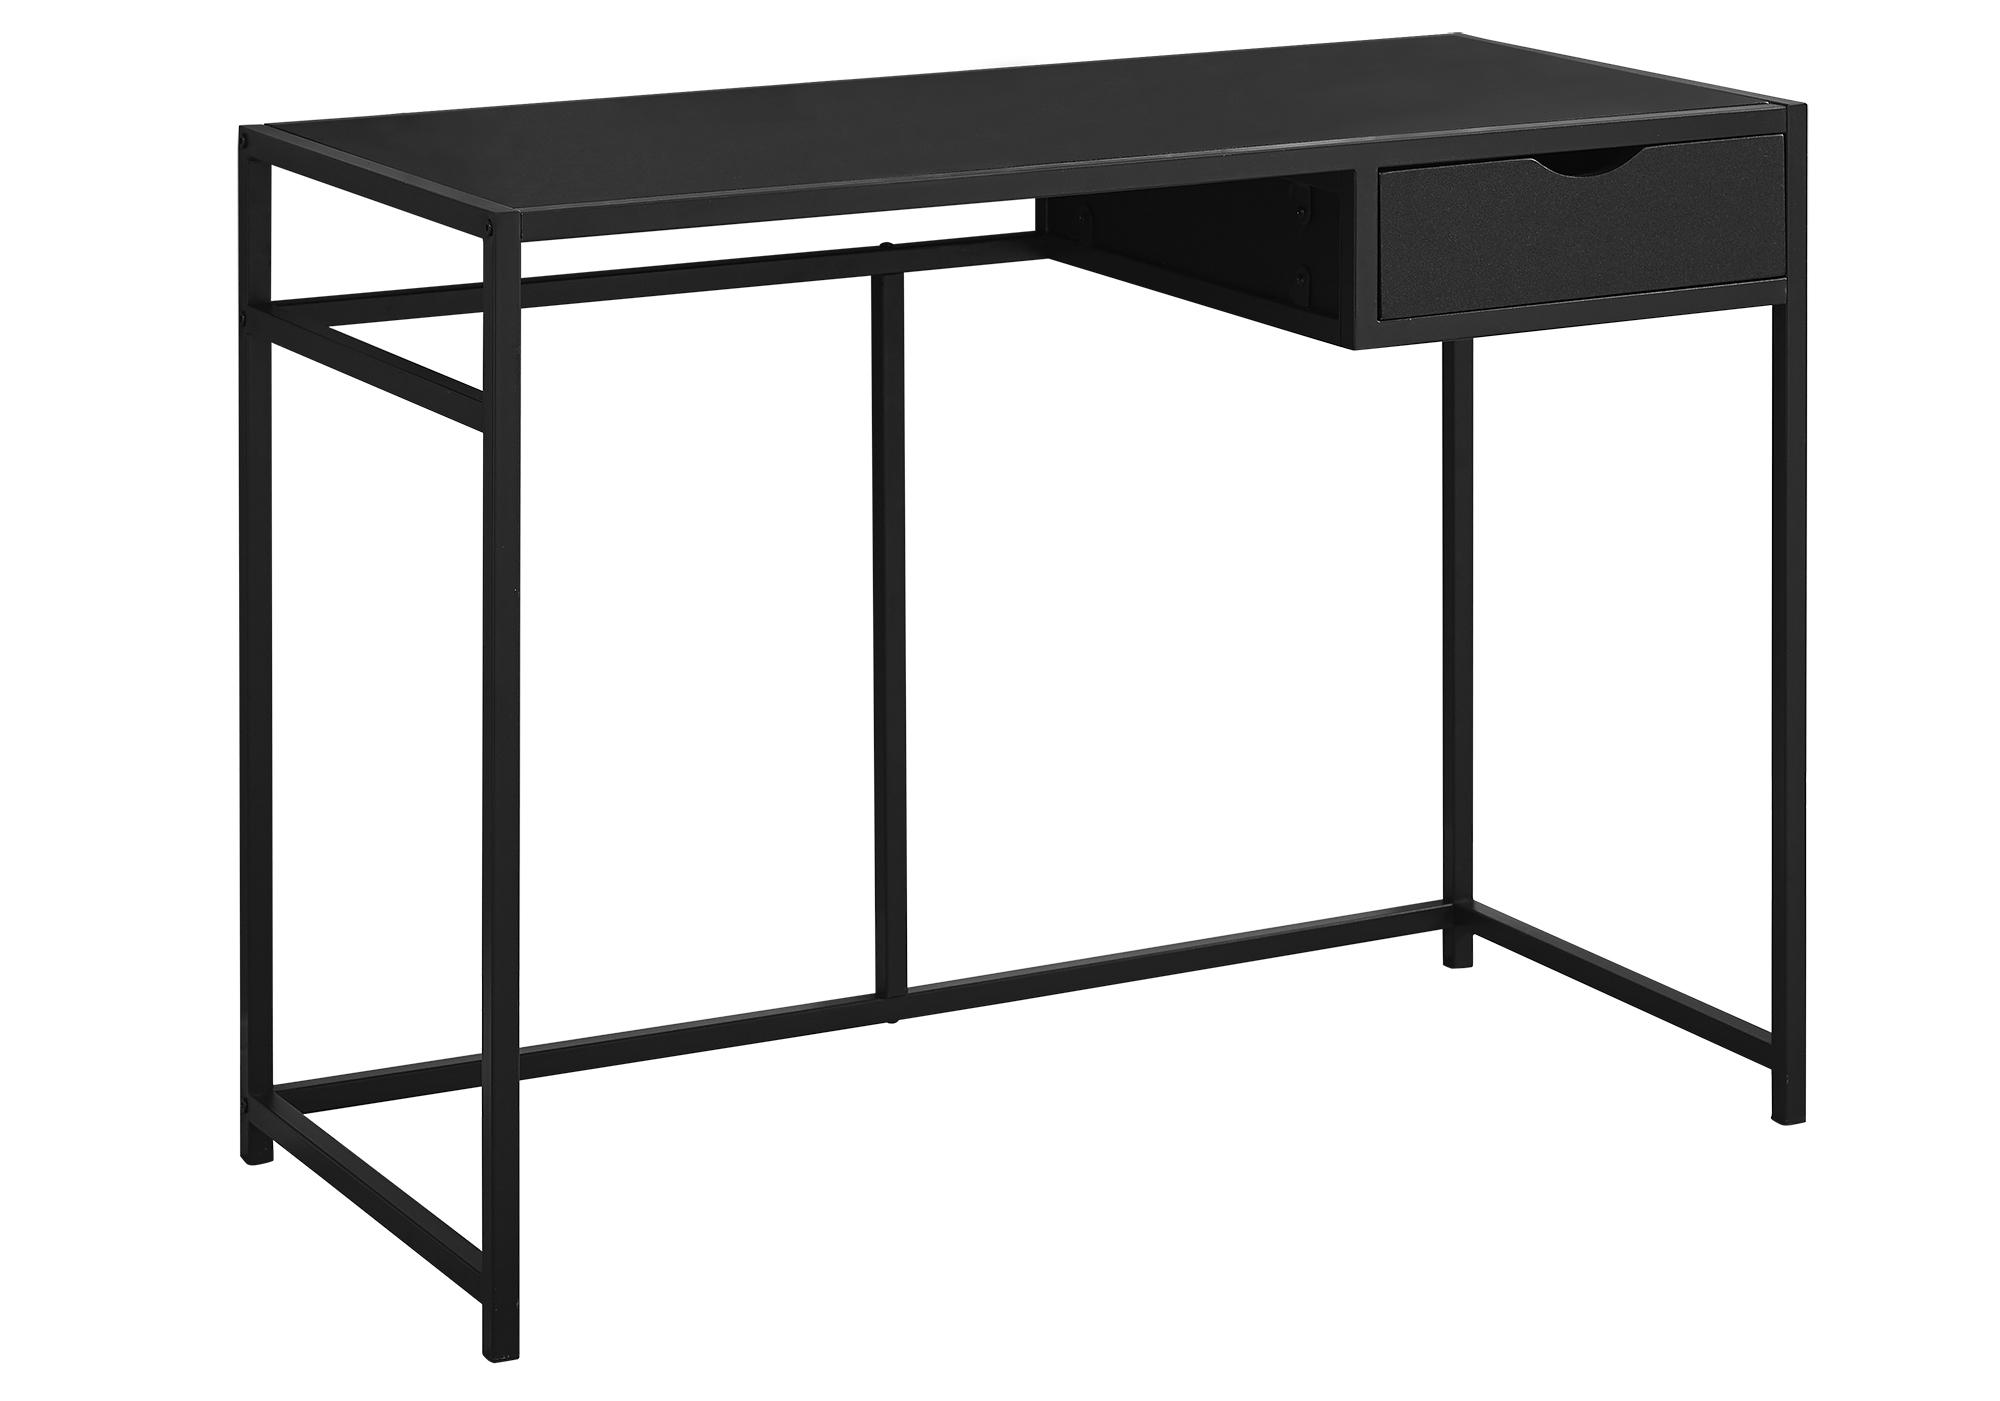 "20"" x 42.25"" x 30"" Black Mdf Metal  Computer Desk"